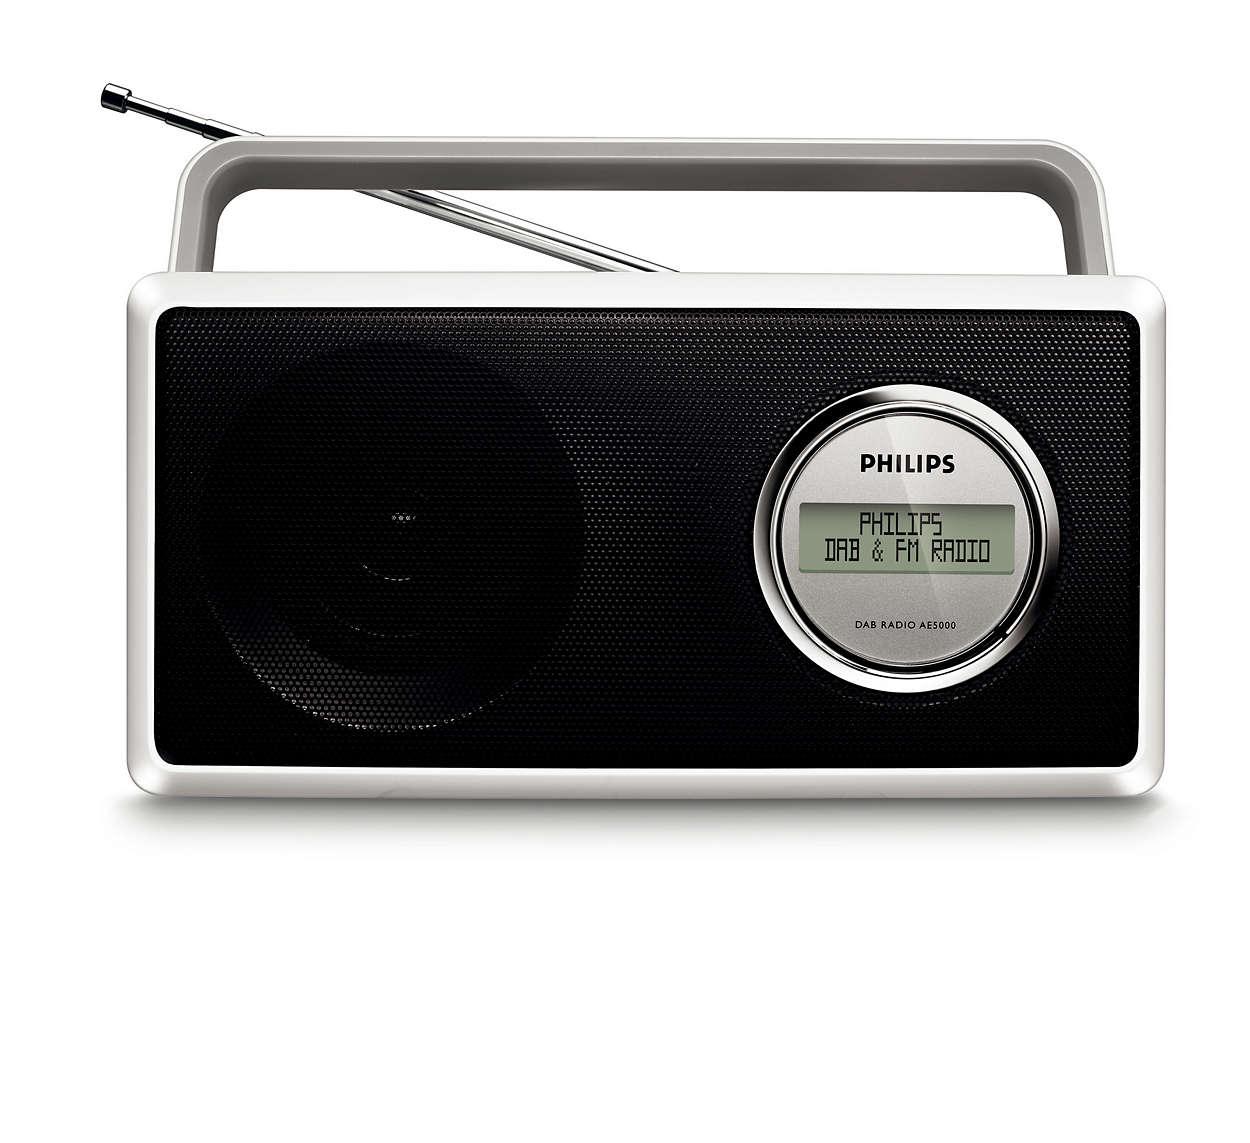 Nyt DAB- og FM-radio med krystallklar lyd